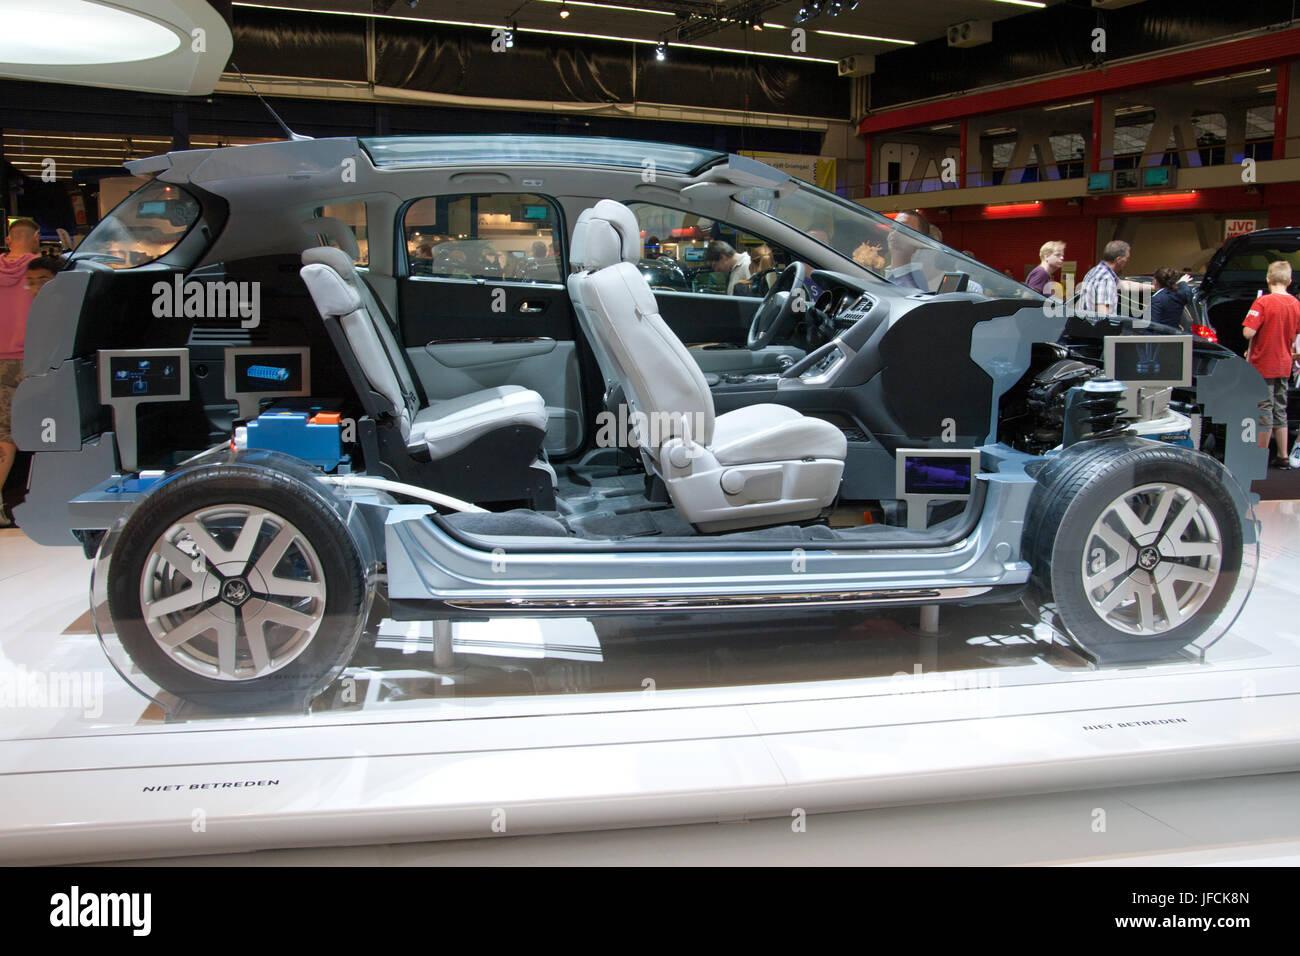 Peugeot Garage Amsterdam : Peugeot stock photos peugeot stock images alamy